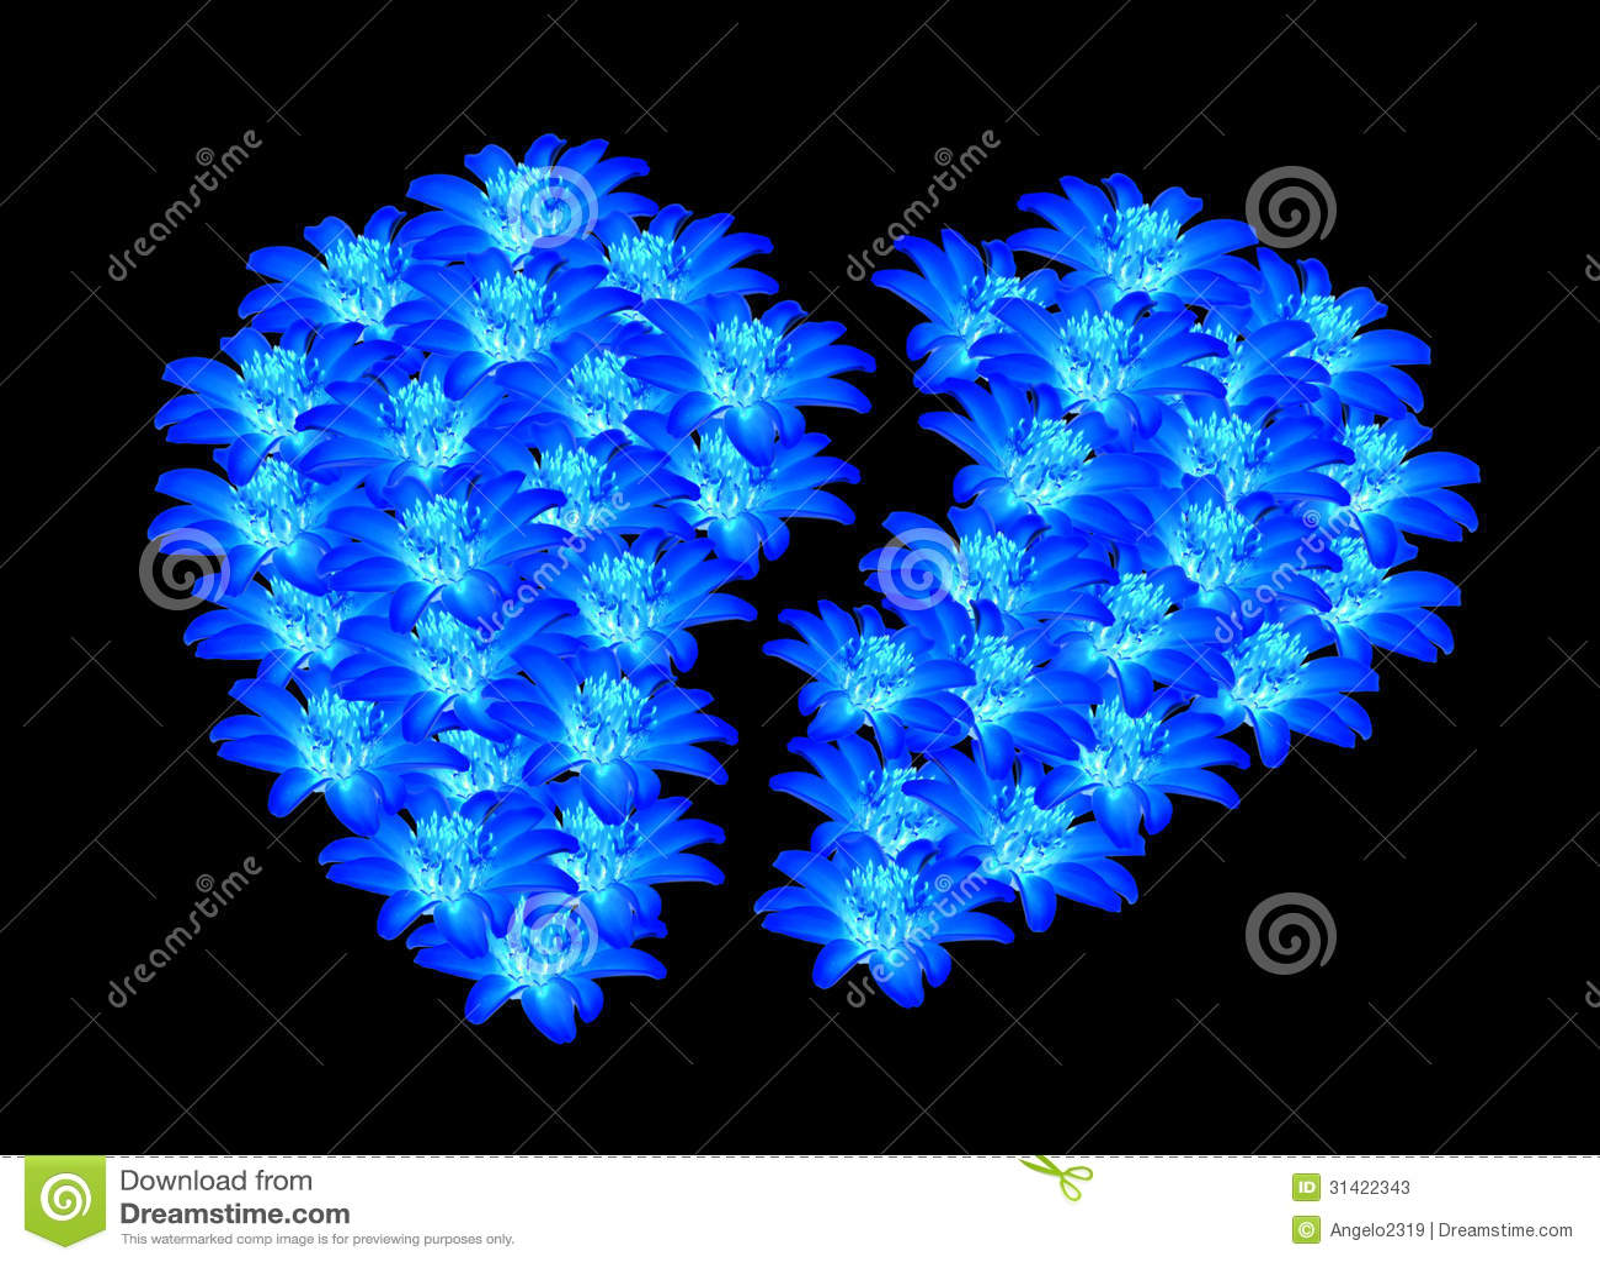 Beautiful blue flowers heart shaped apart stock image image of beautiful blue flowers heart shaped apart izmirmasajfo